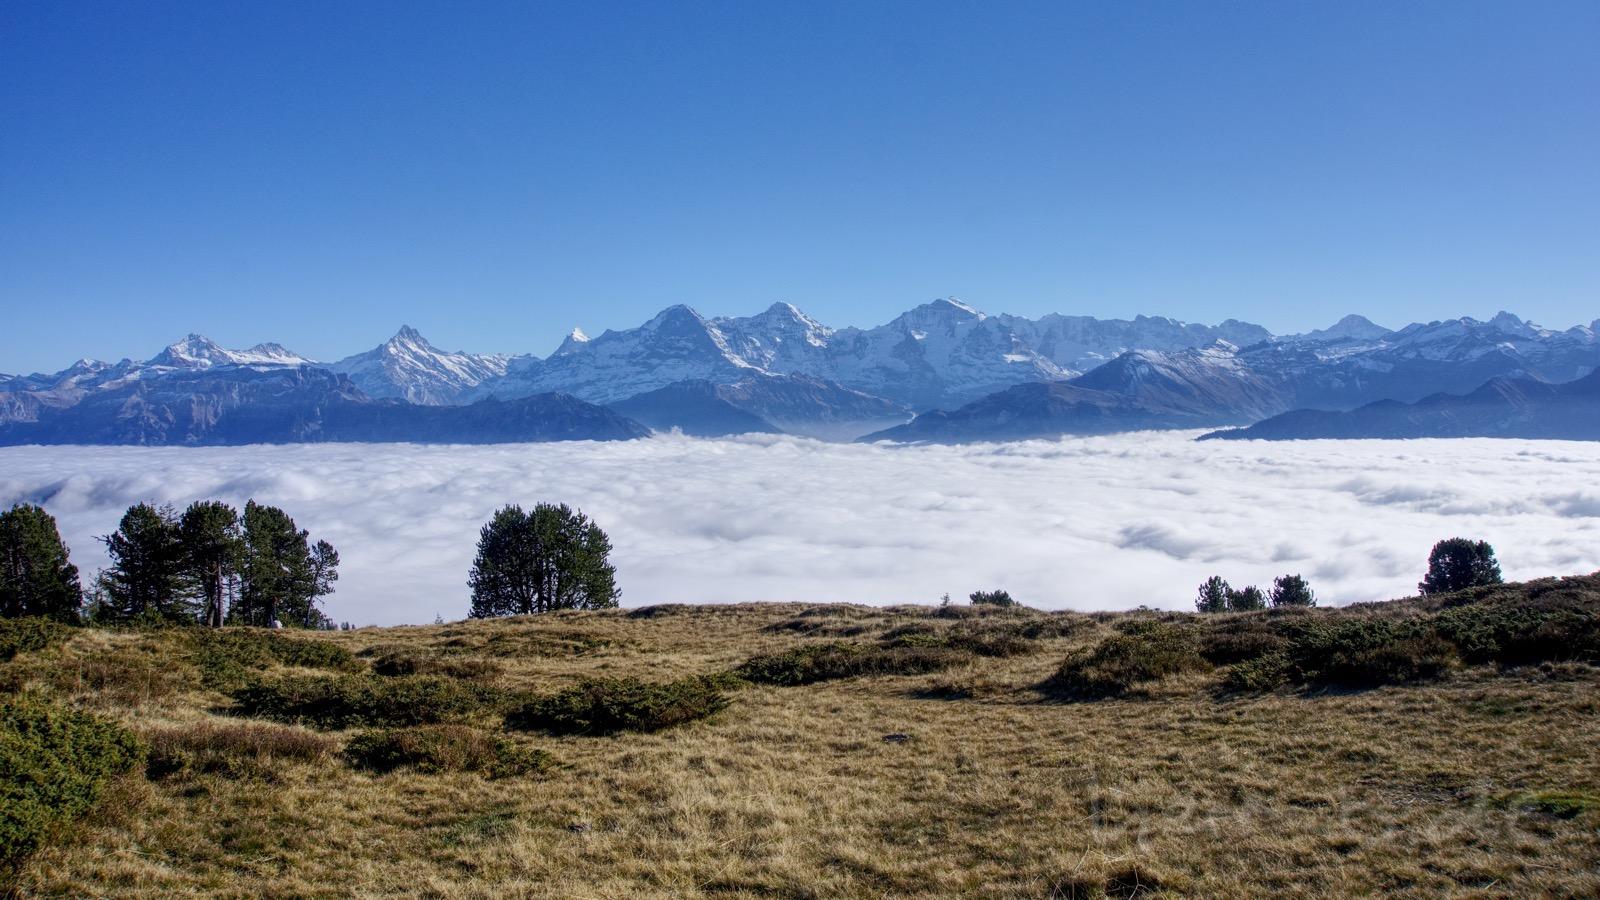 Das wunderschöne Berner Oberland-Panorama über dem Nebel.